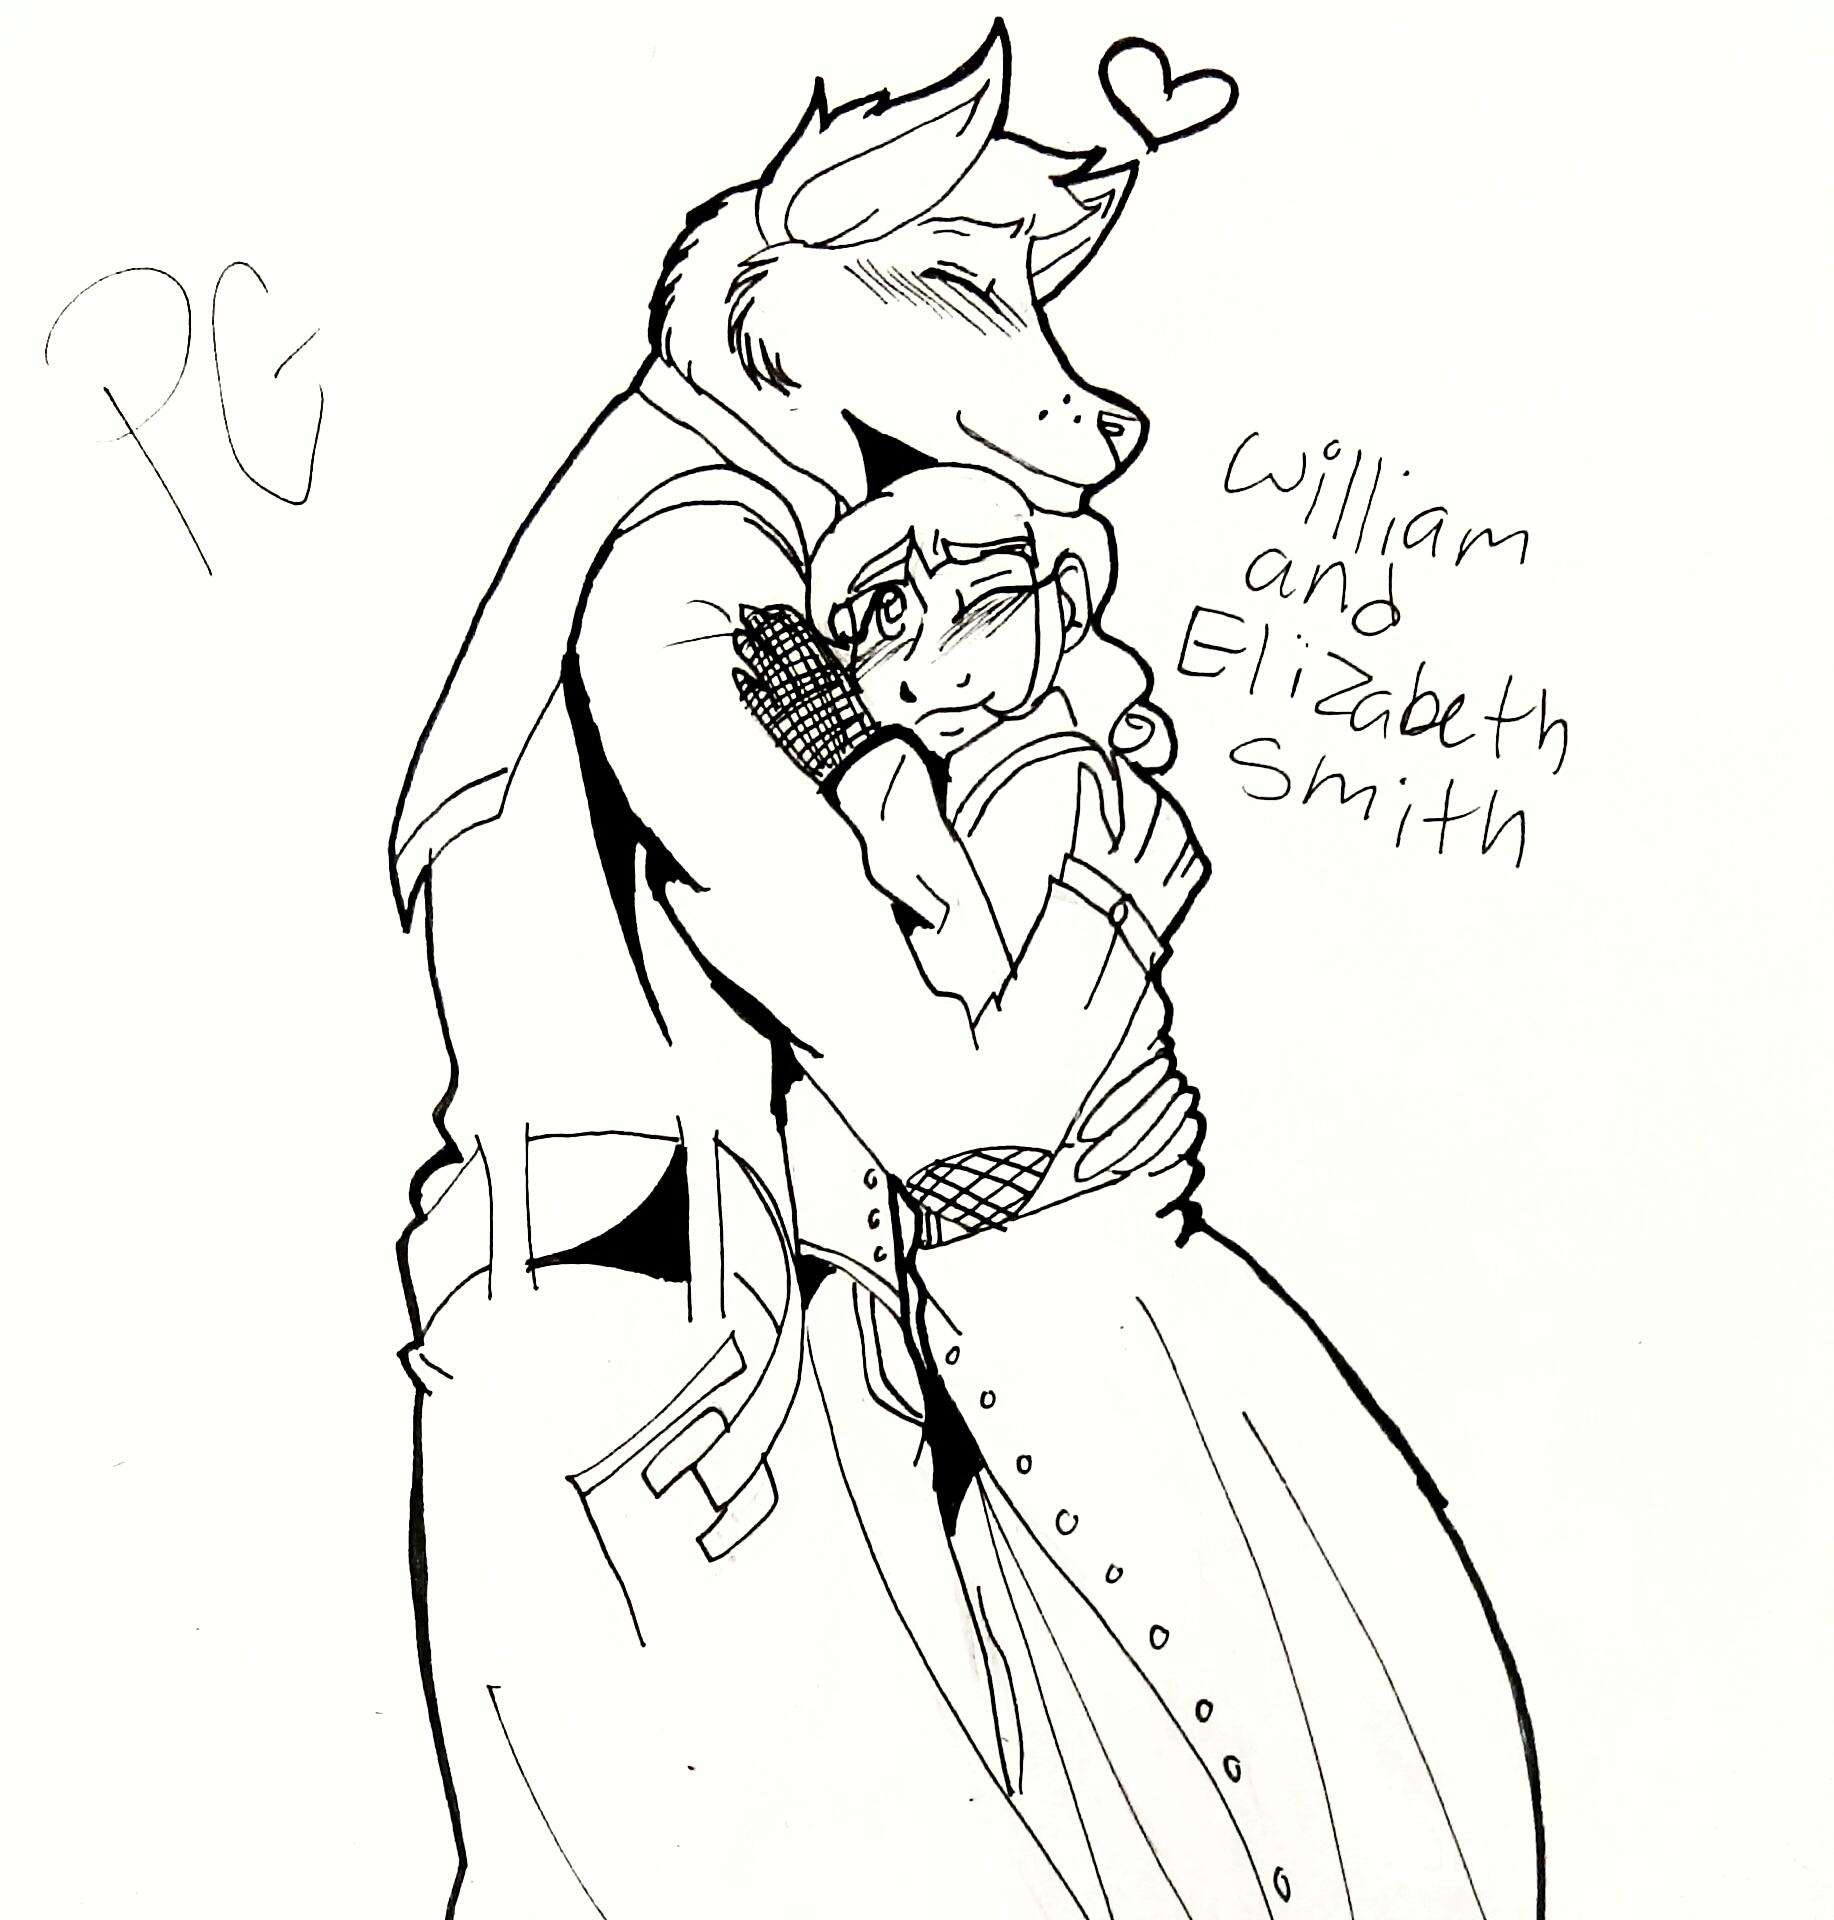 William & Elizabeth Smith